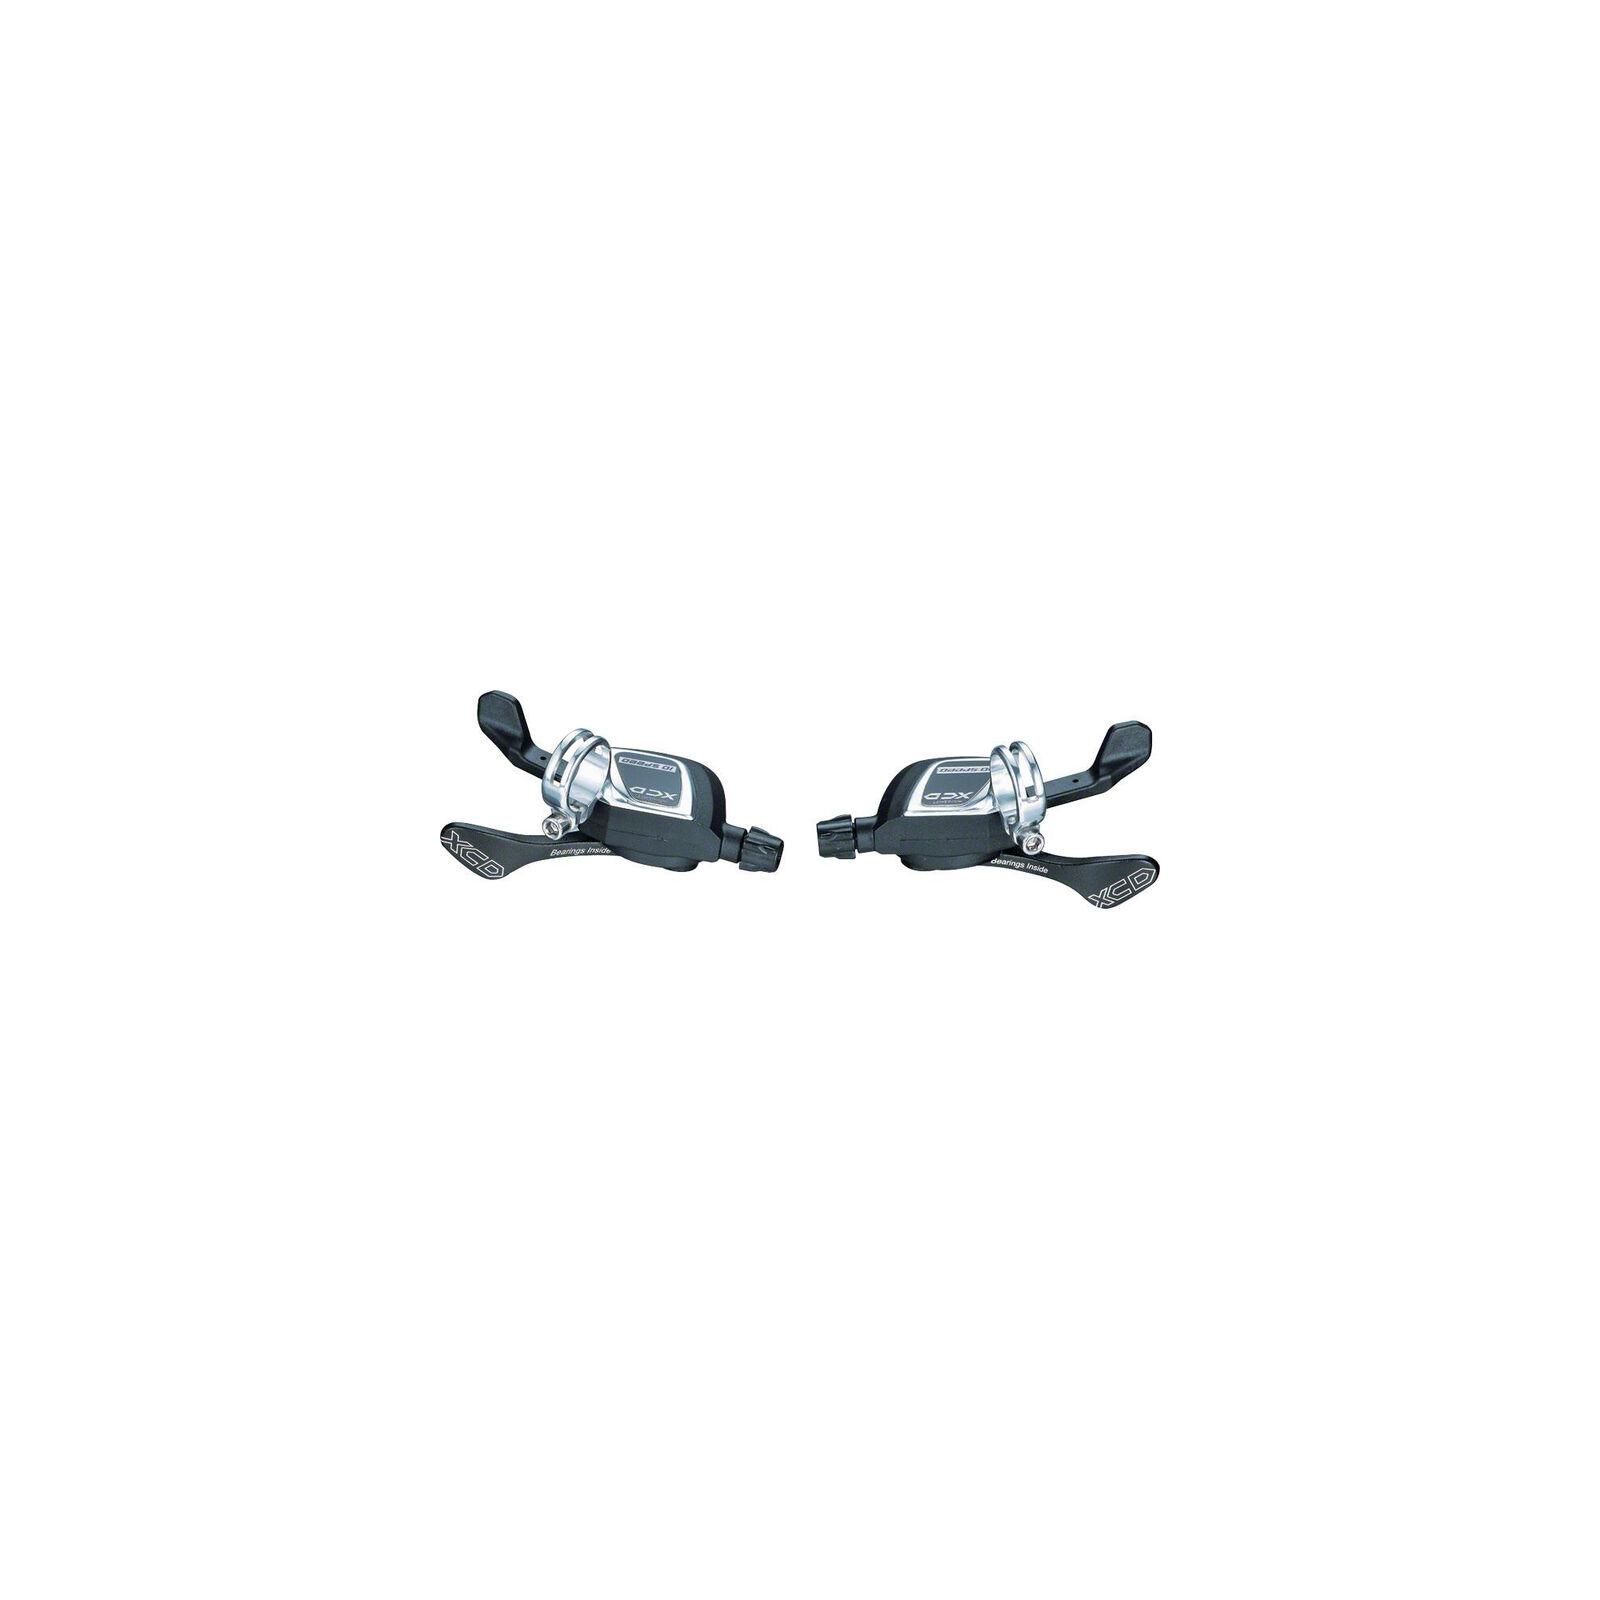 Microshift XCD Xpress 2x10 Trigger Shifters, Shimano 10-Speed